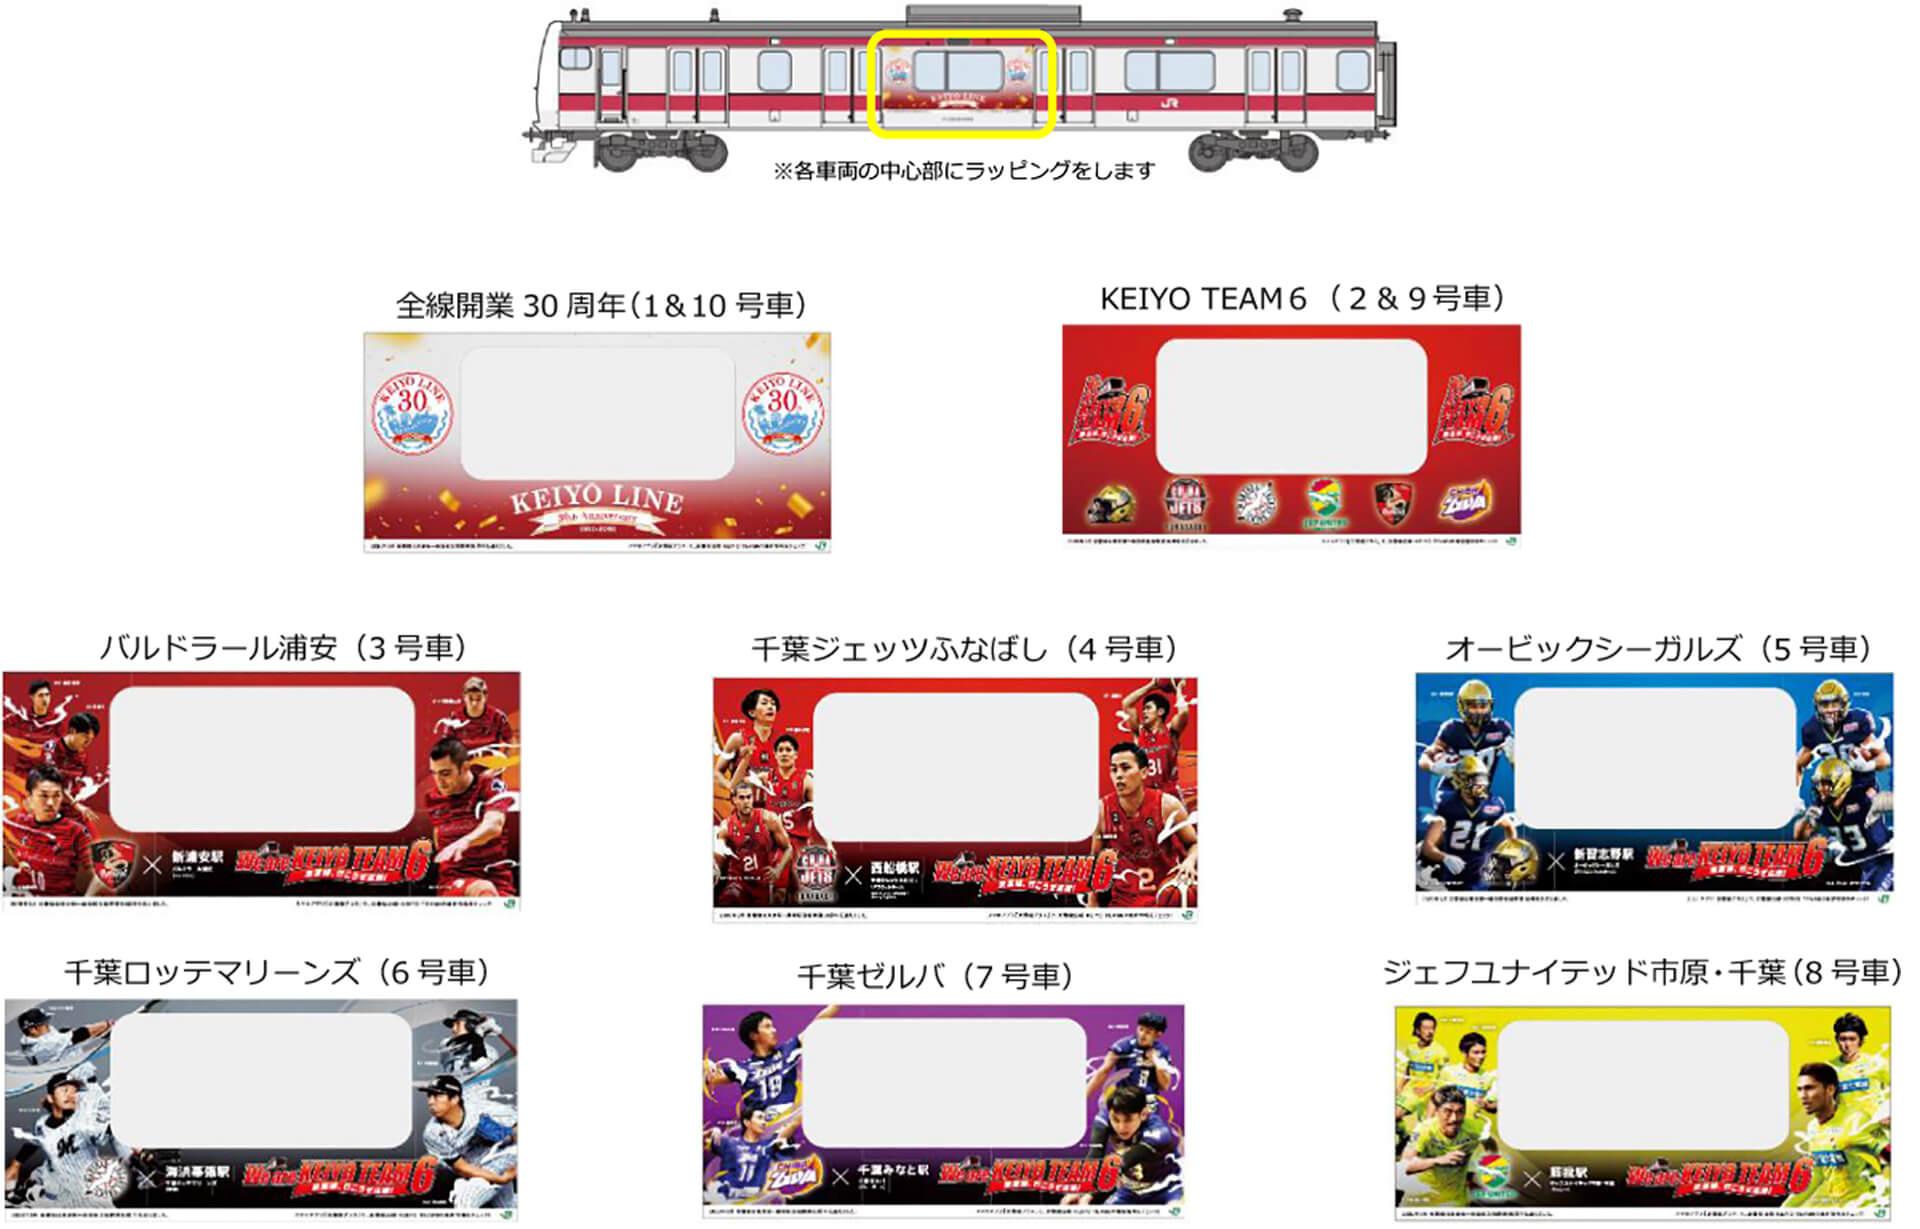 『KEIYO TEAM6』ラッピングトレイン